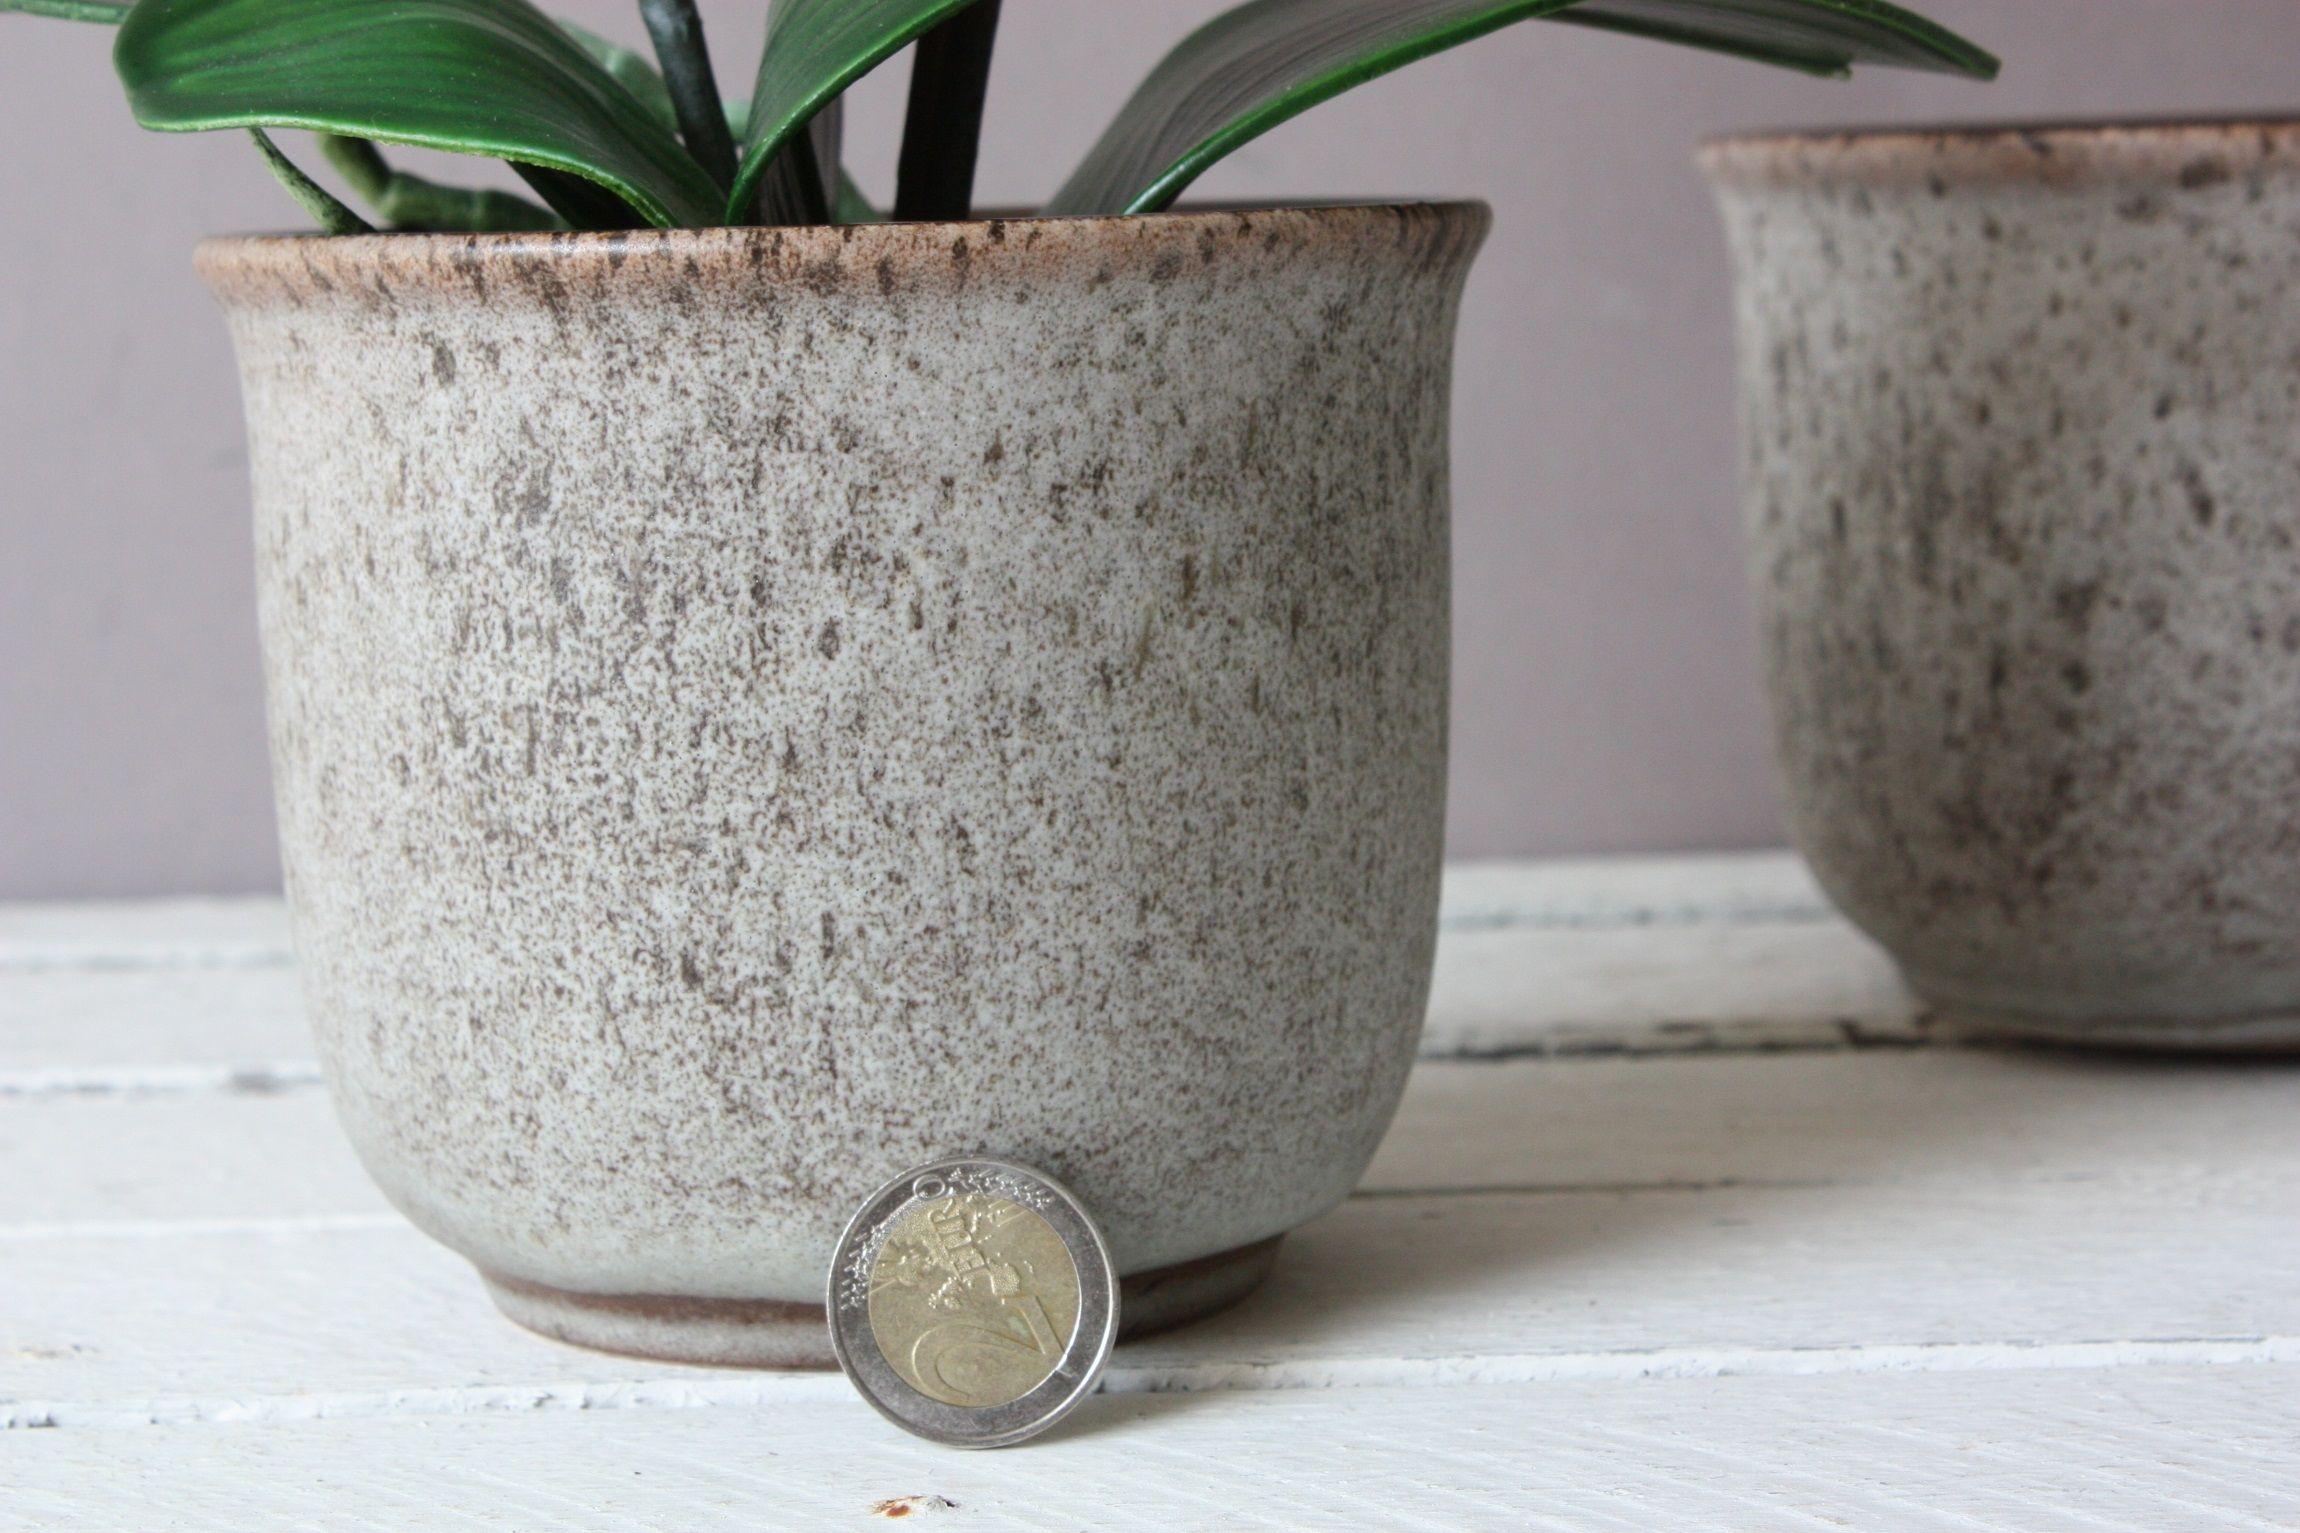 1 Small Scheurich Planter Ceramic 60s 70s Vintage Flower Pot West German Flowerpot Retro Gift Girlfriend Wife Vintage Flower Pots Flower Pots Decorated Flower Pots